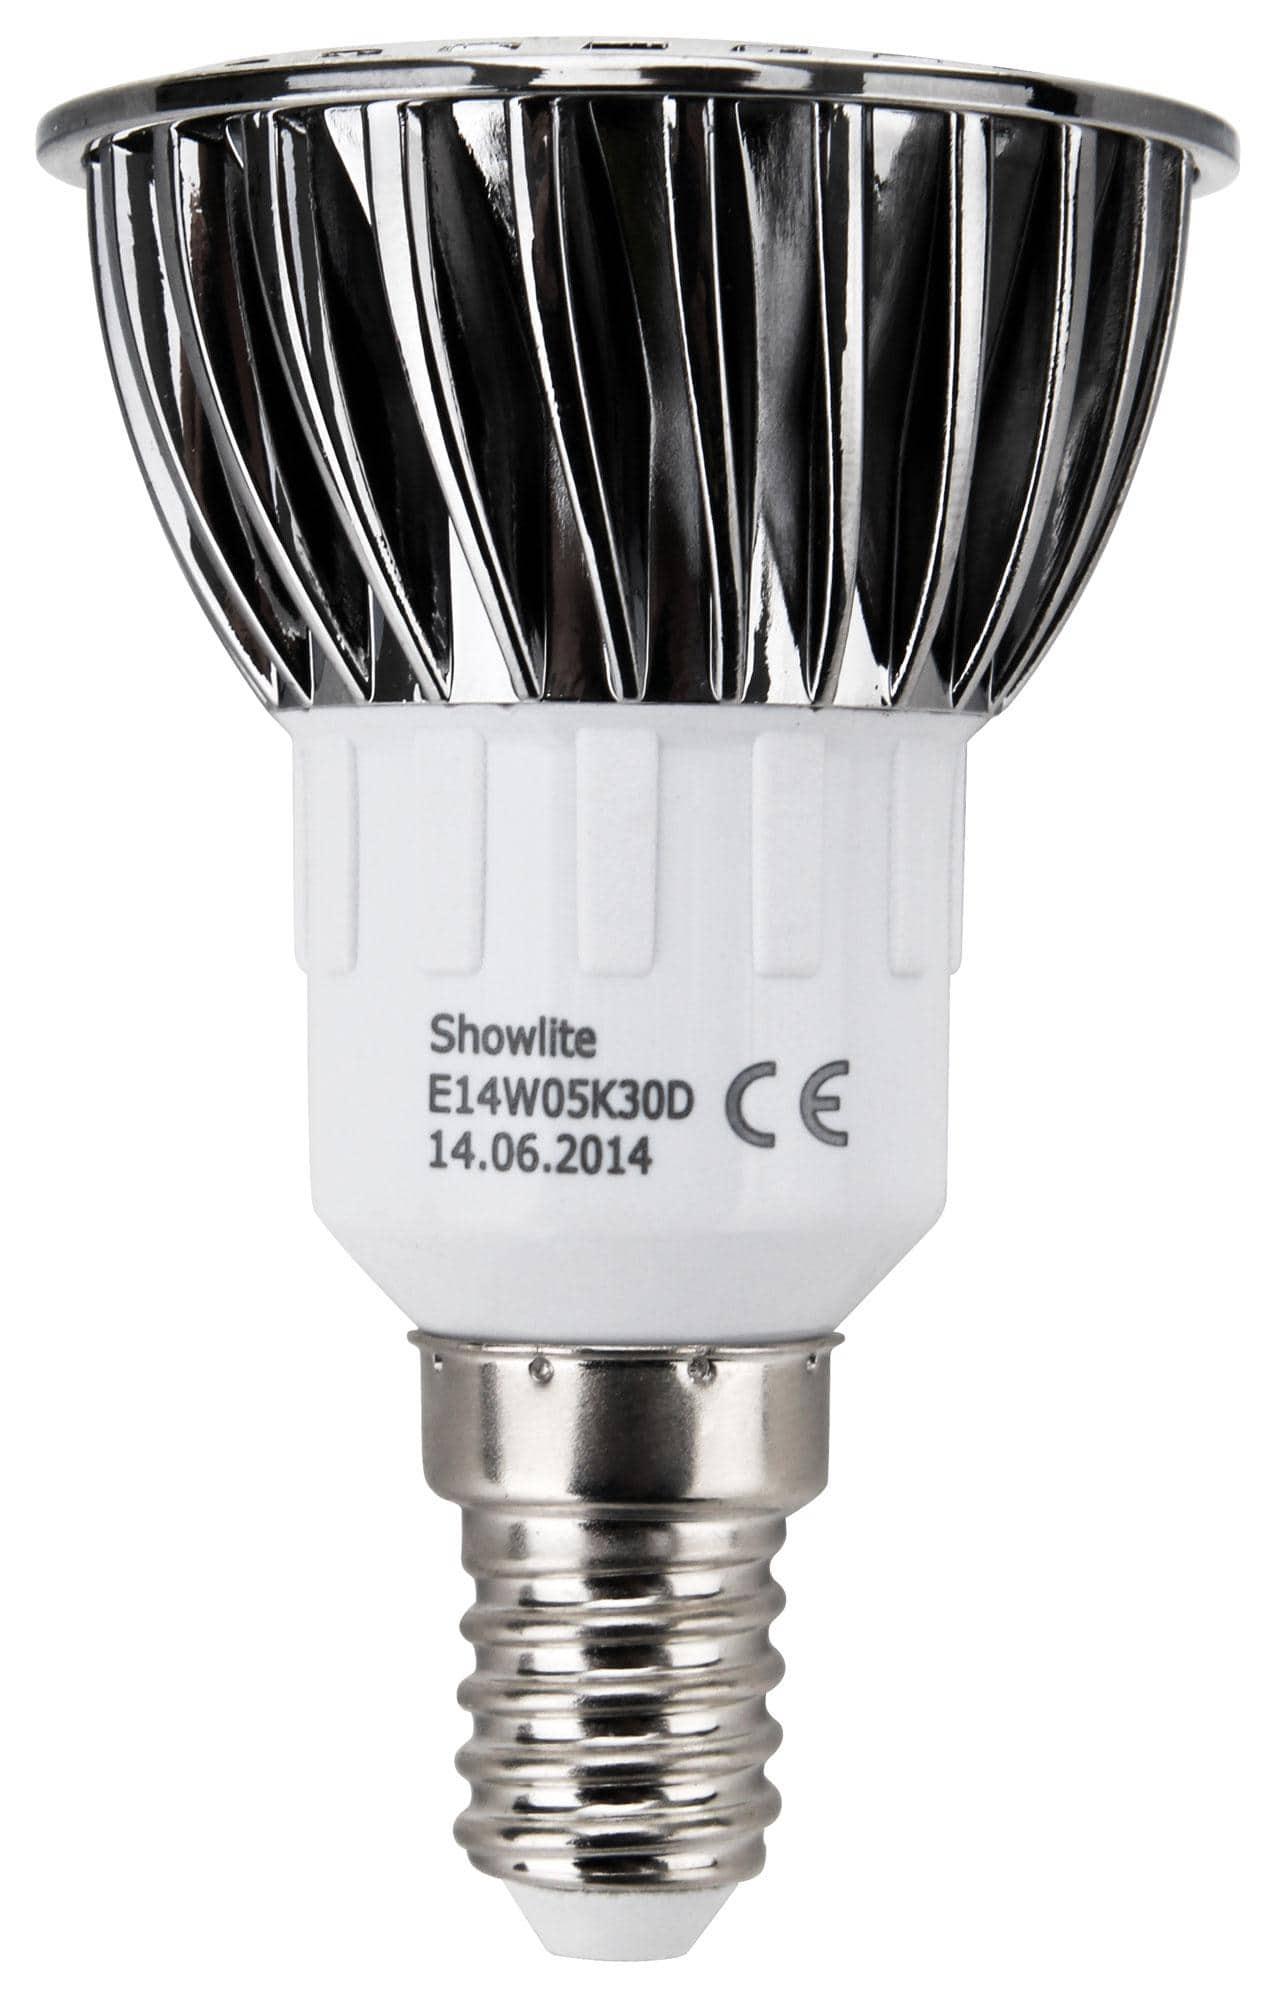 showlite led spot e14w05k30n 5 watt 330 lumen sockel e14 3000 kelvin. Black Bedroom Furniture Sets. Home Design Ideas